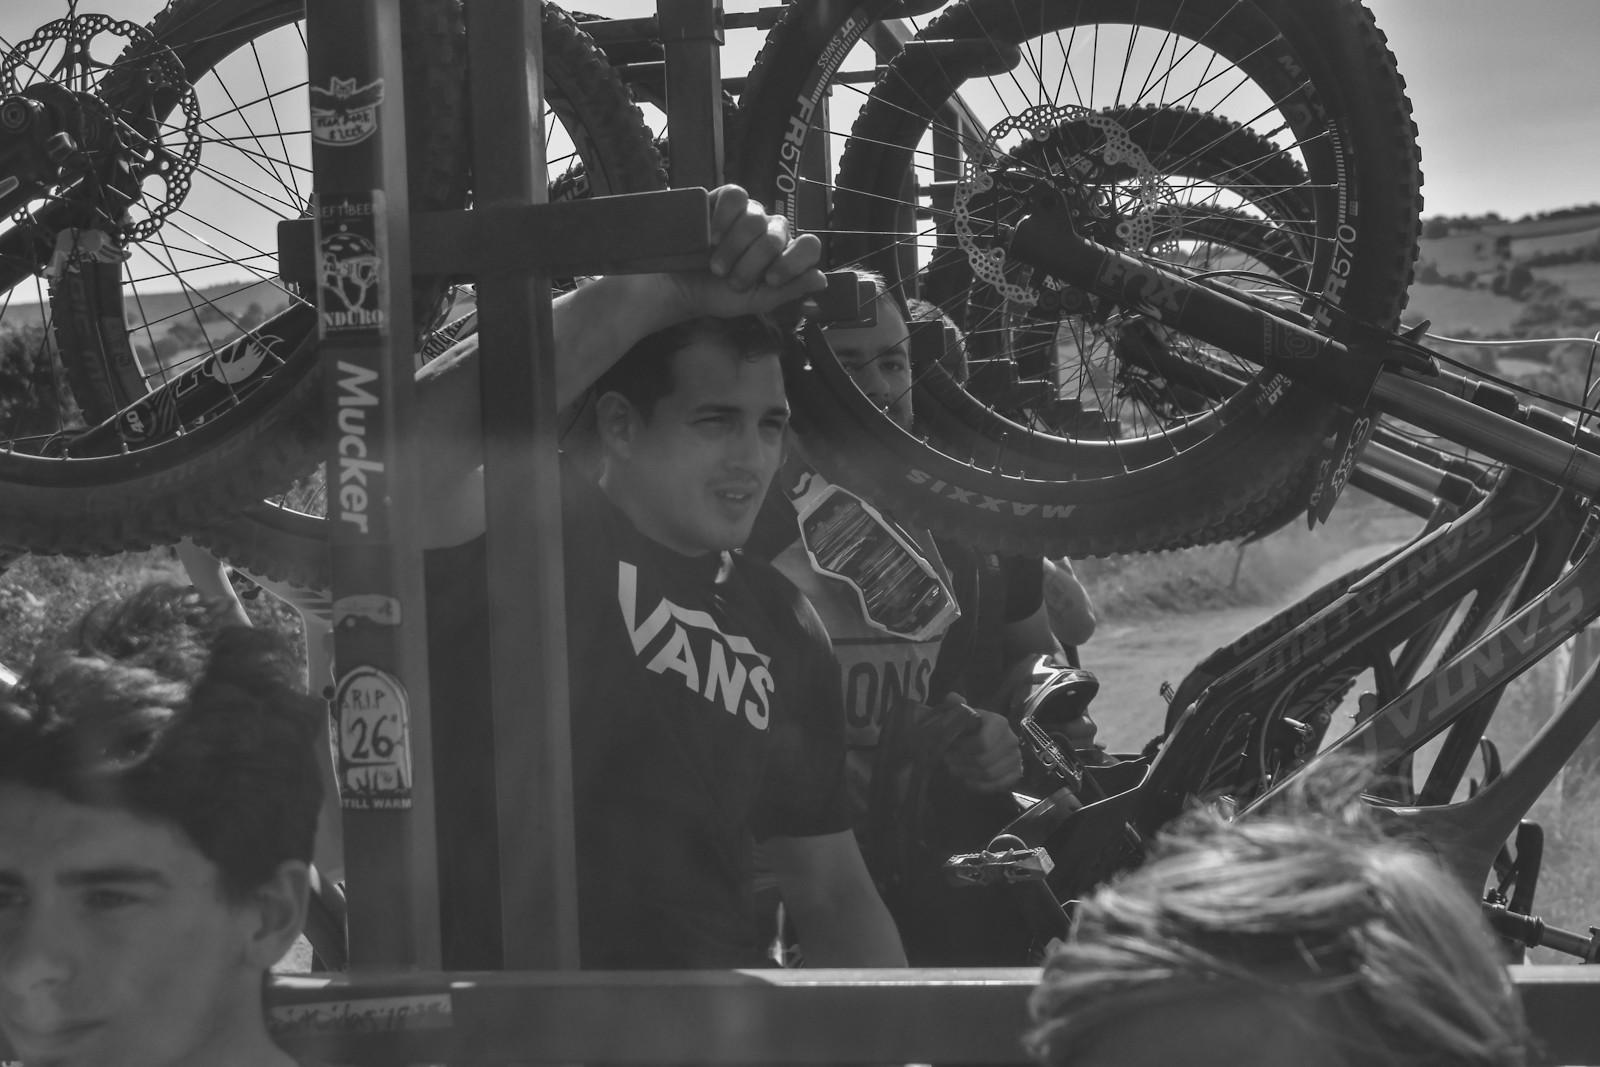 ROB1480 - robbarkerimages2017 - Mountain Biking Pictures - Vital MTB